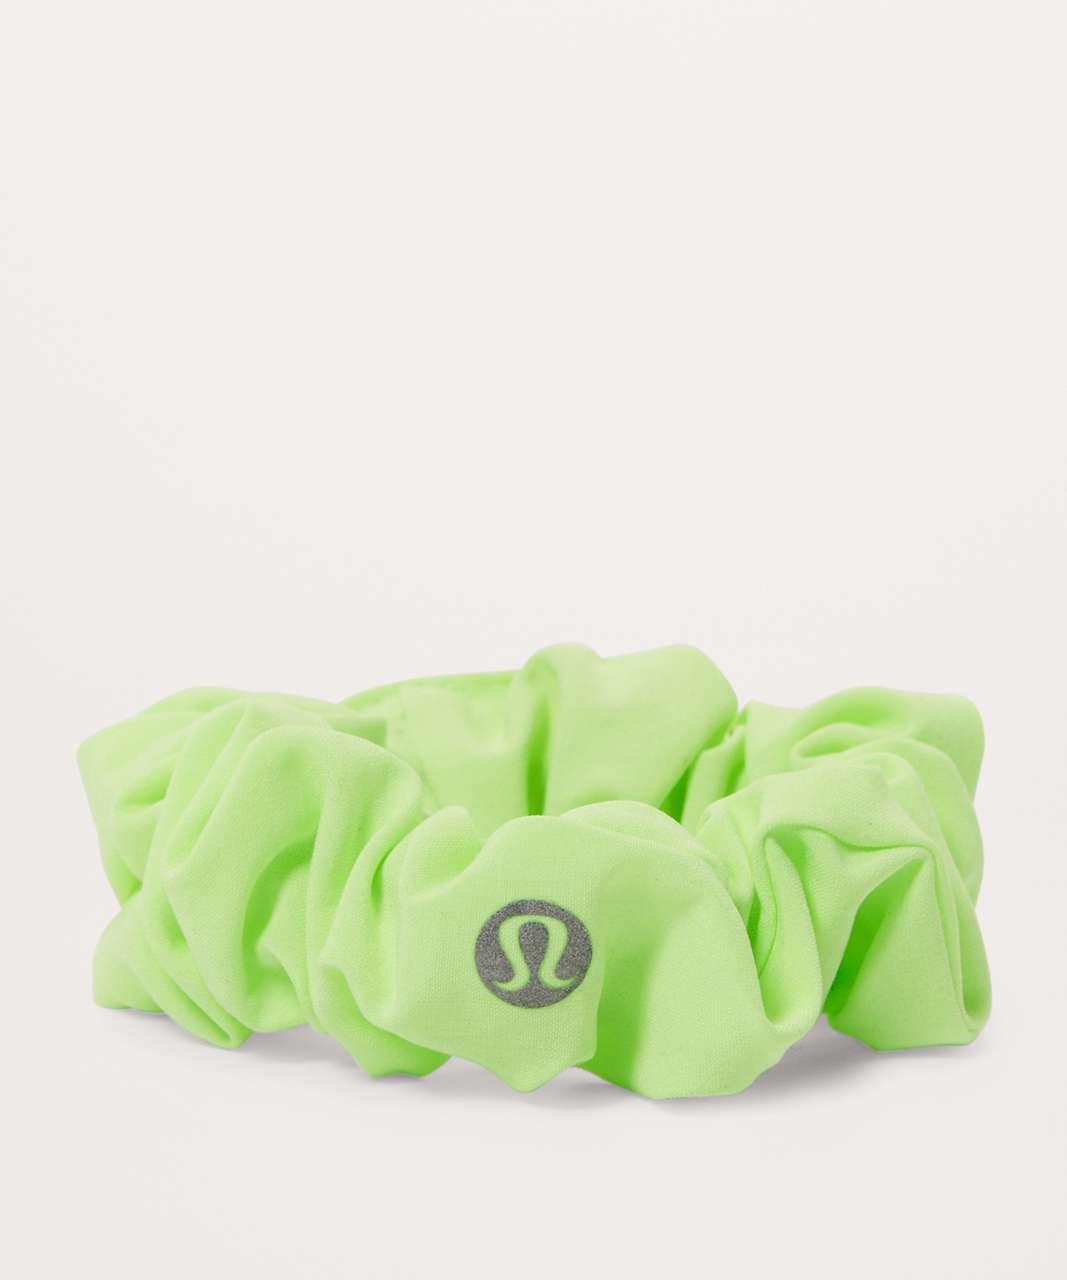 Lululemon Uplifting Scrunchie - Clear Mint